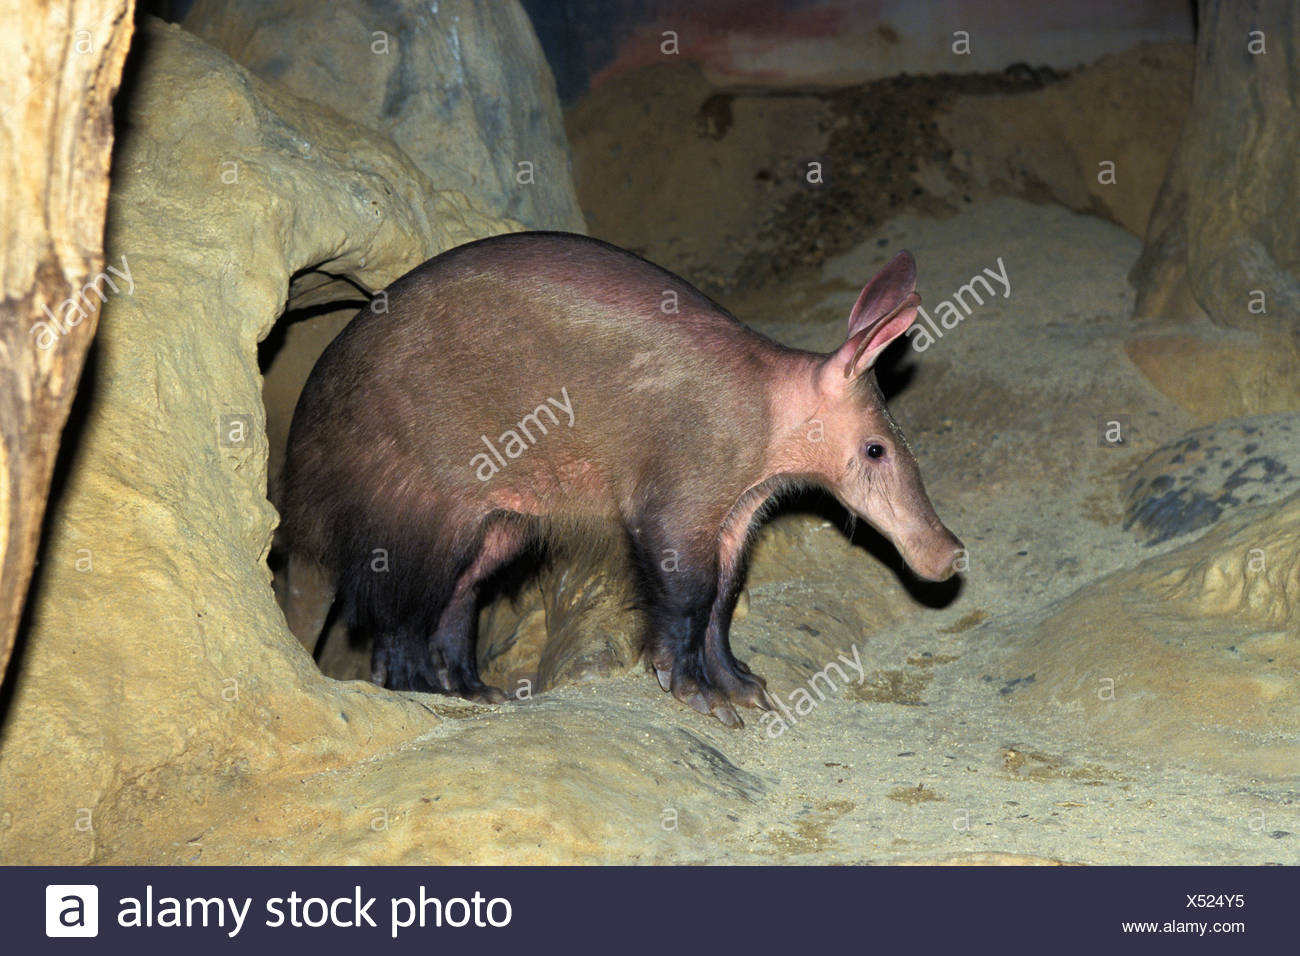 Aardvark (Orycteropus afer) leaving den, zoo, Africa - Stock Image